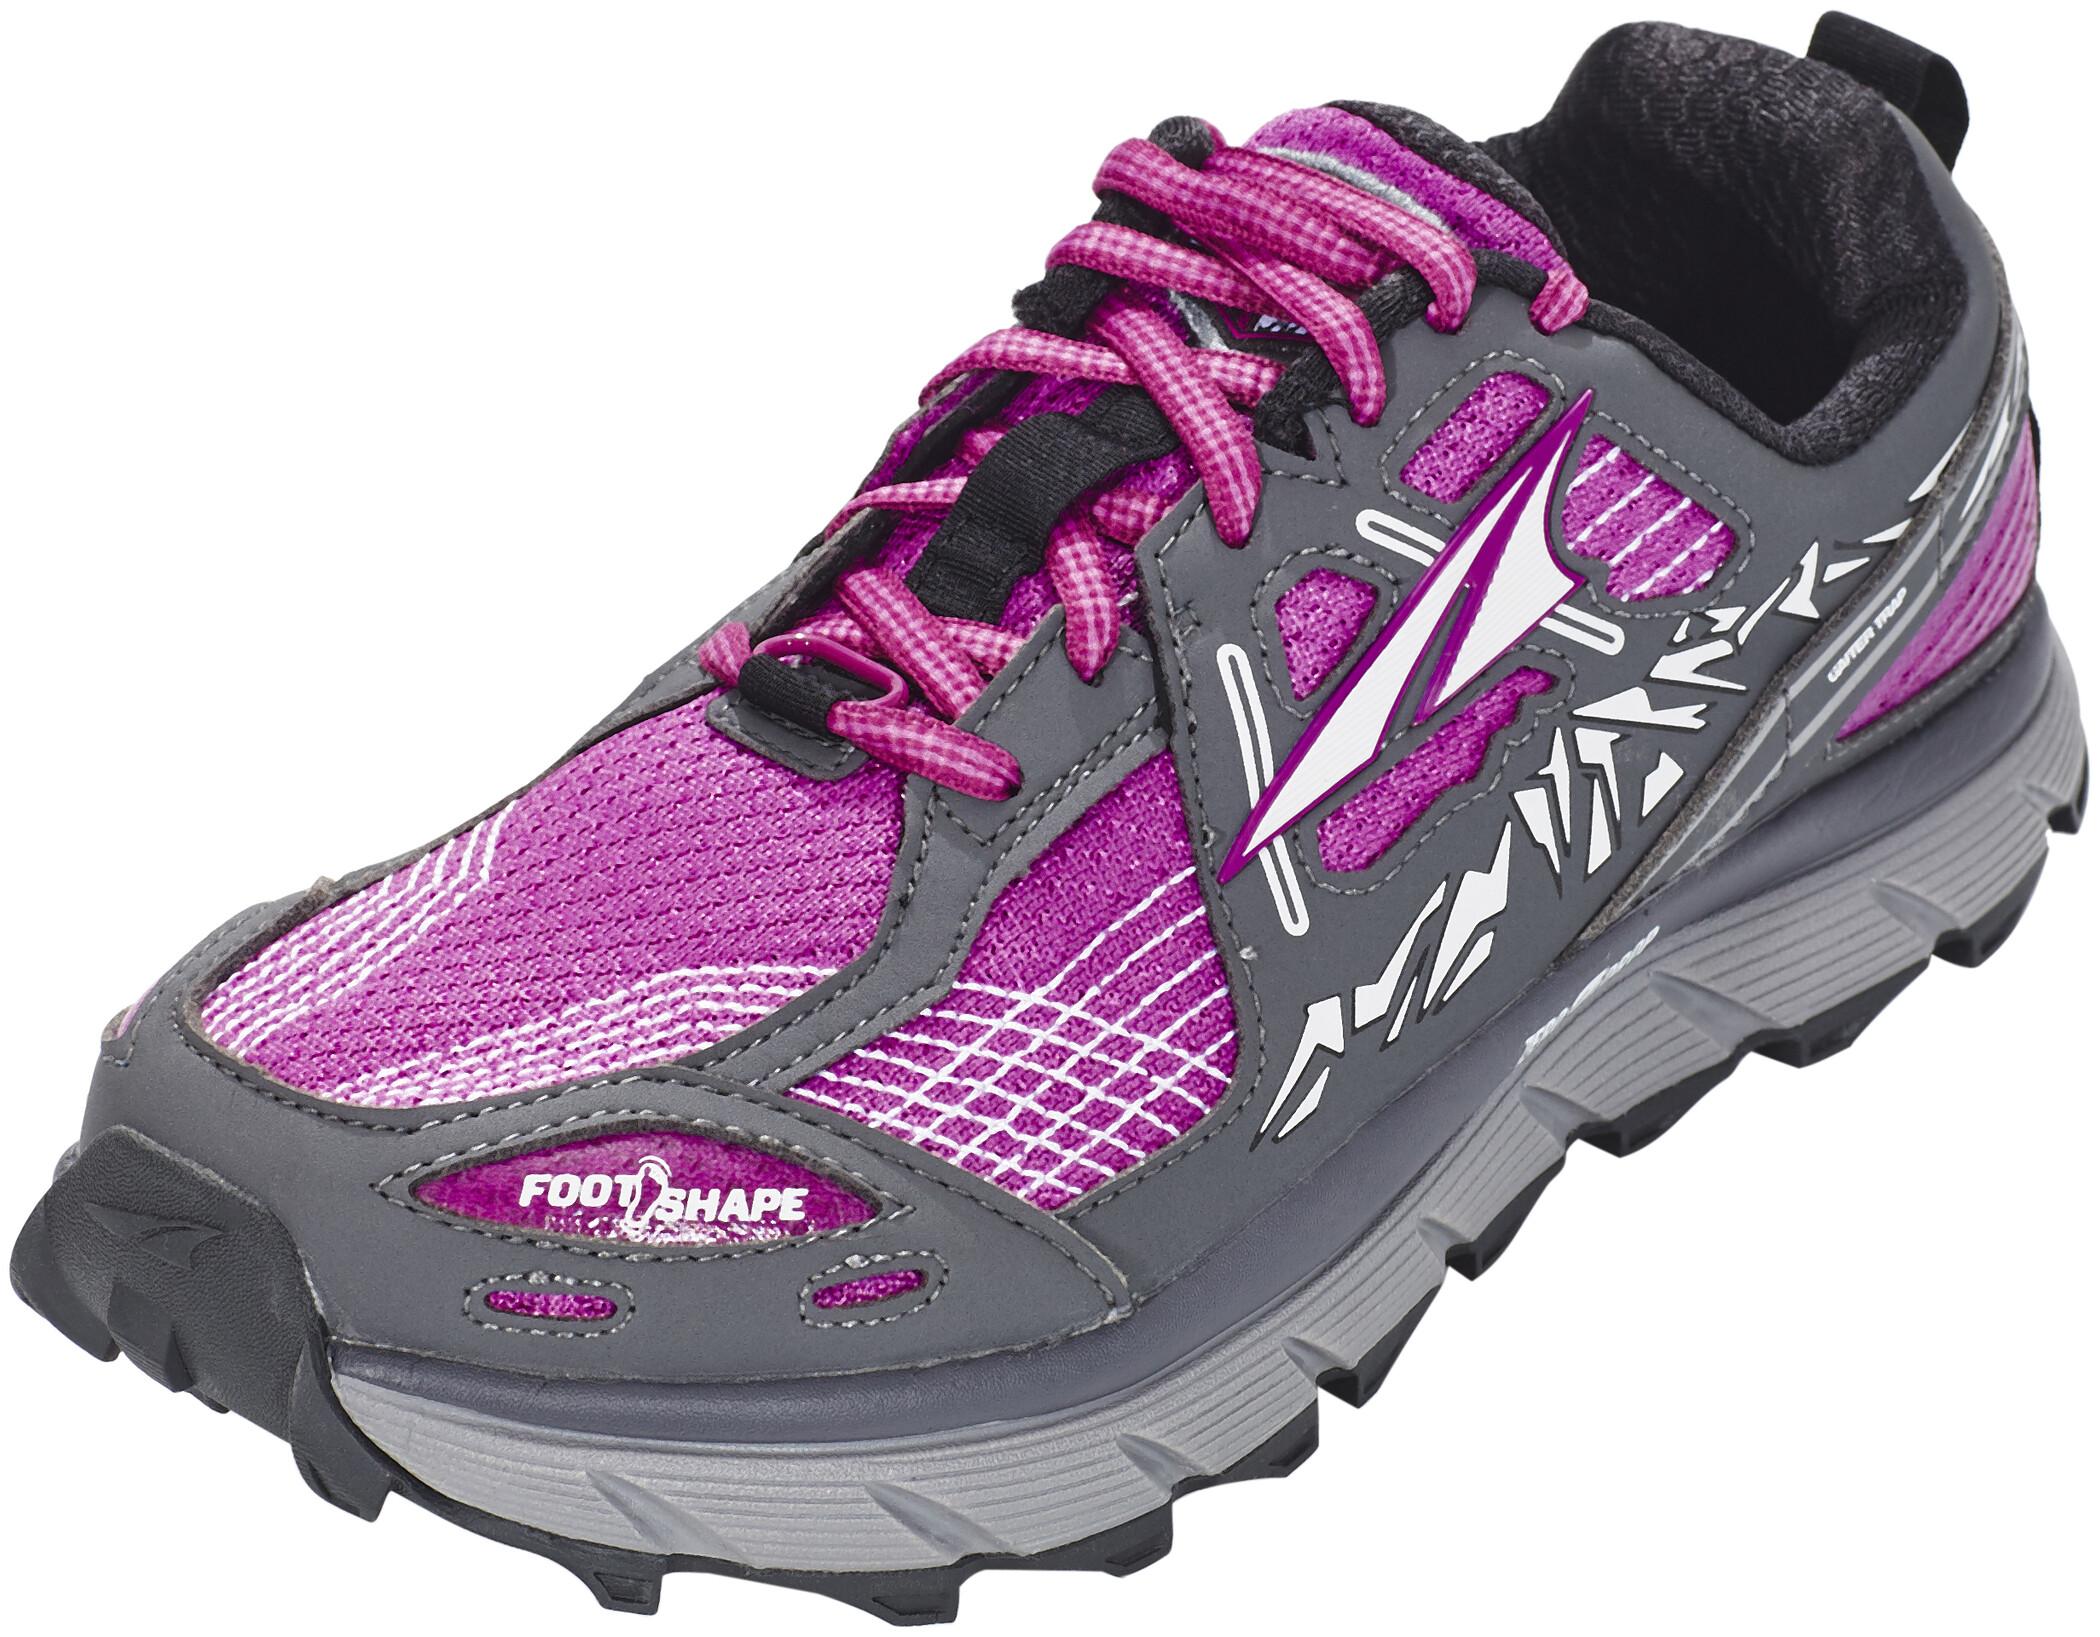 Altra Lone Peak 3.5 Løbesko Damer, pink and gray | Running shoes